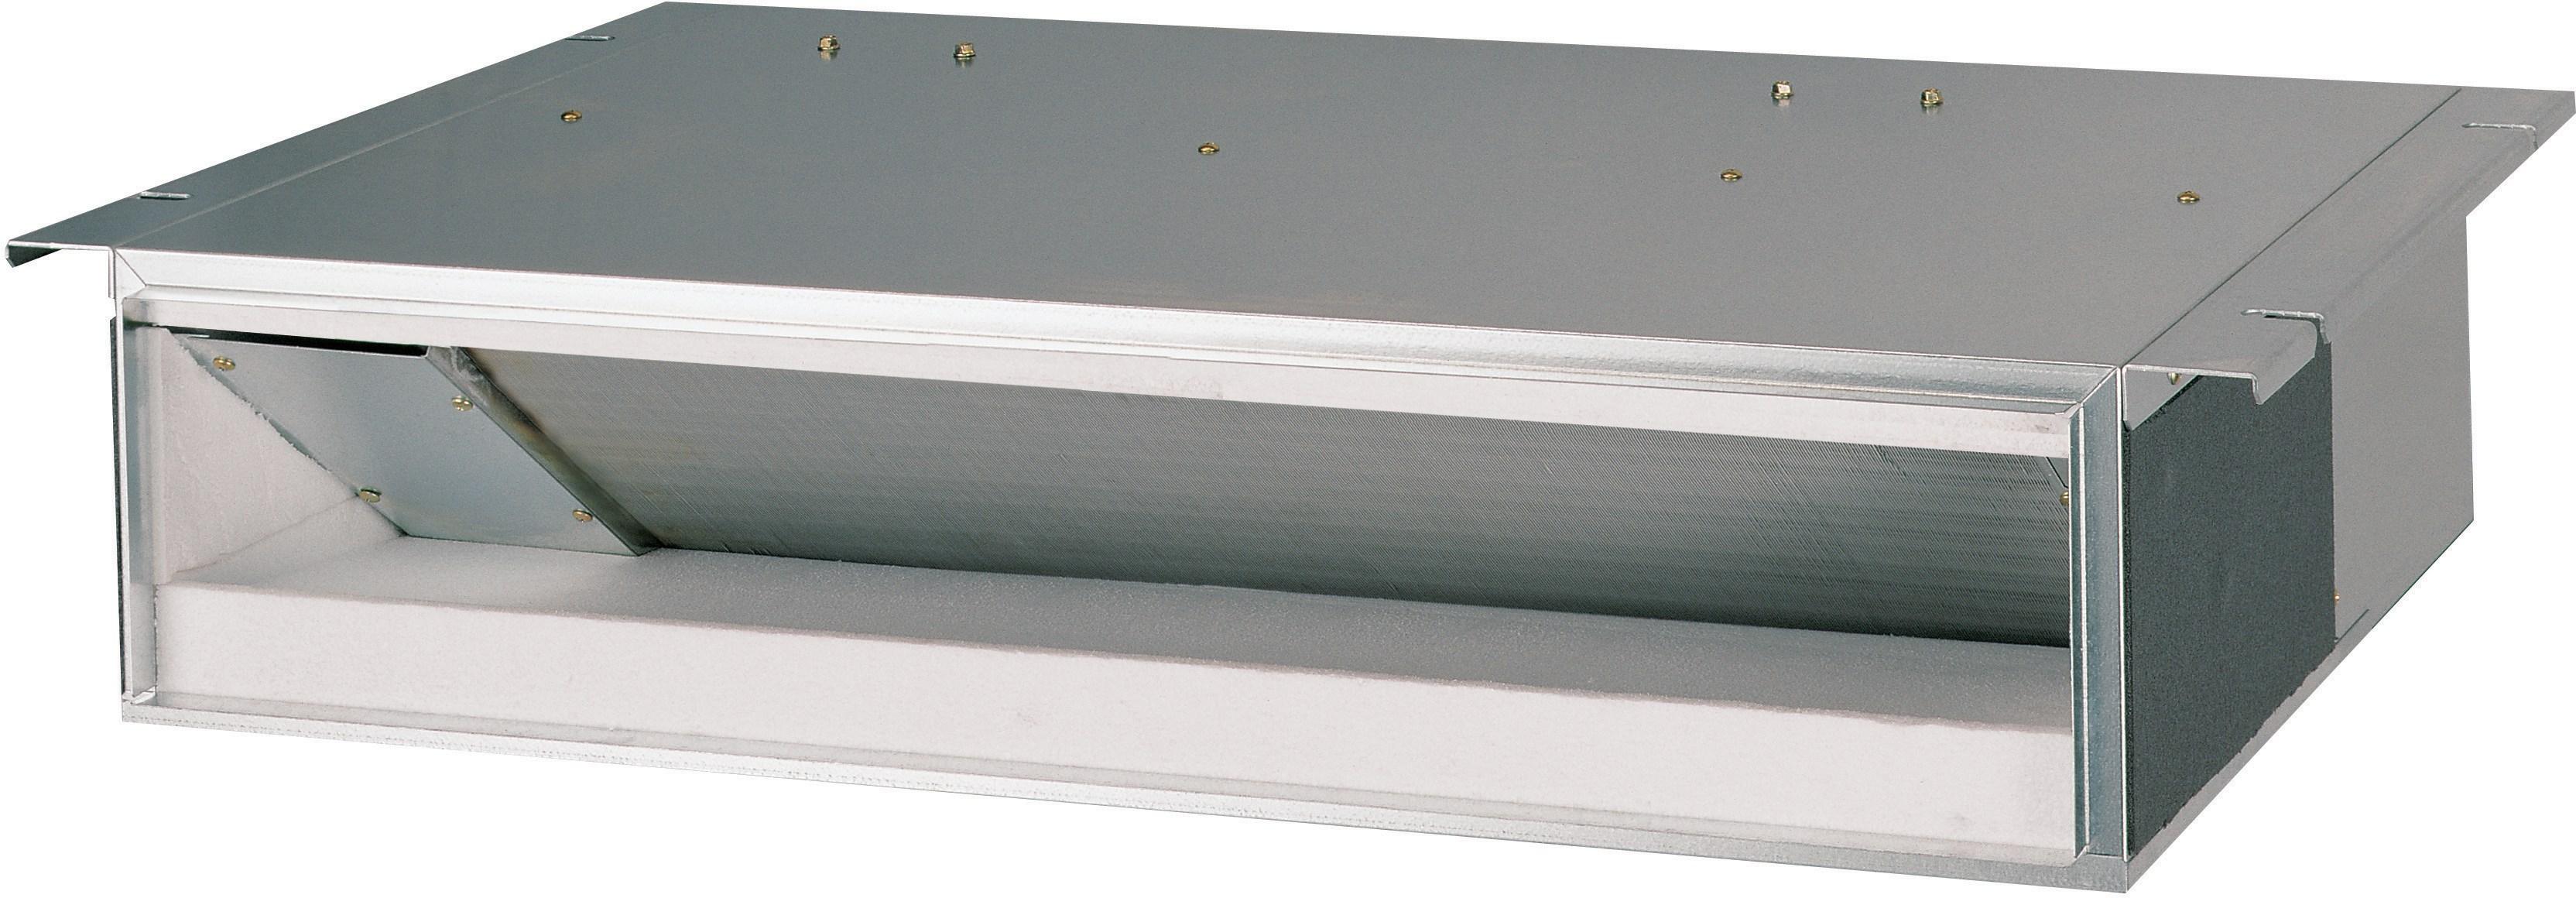 Lg Lmdn096hv 9 000 Class Btu Concealed Duct Mini Split